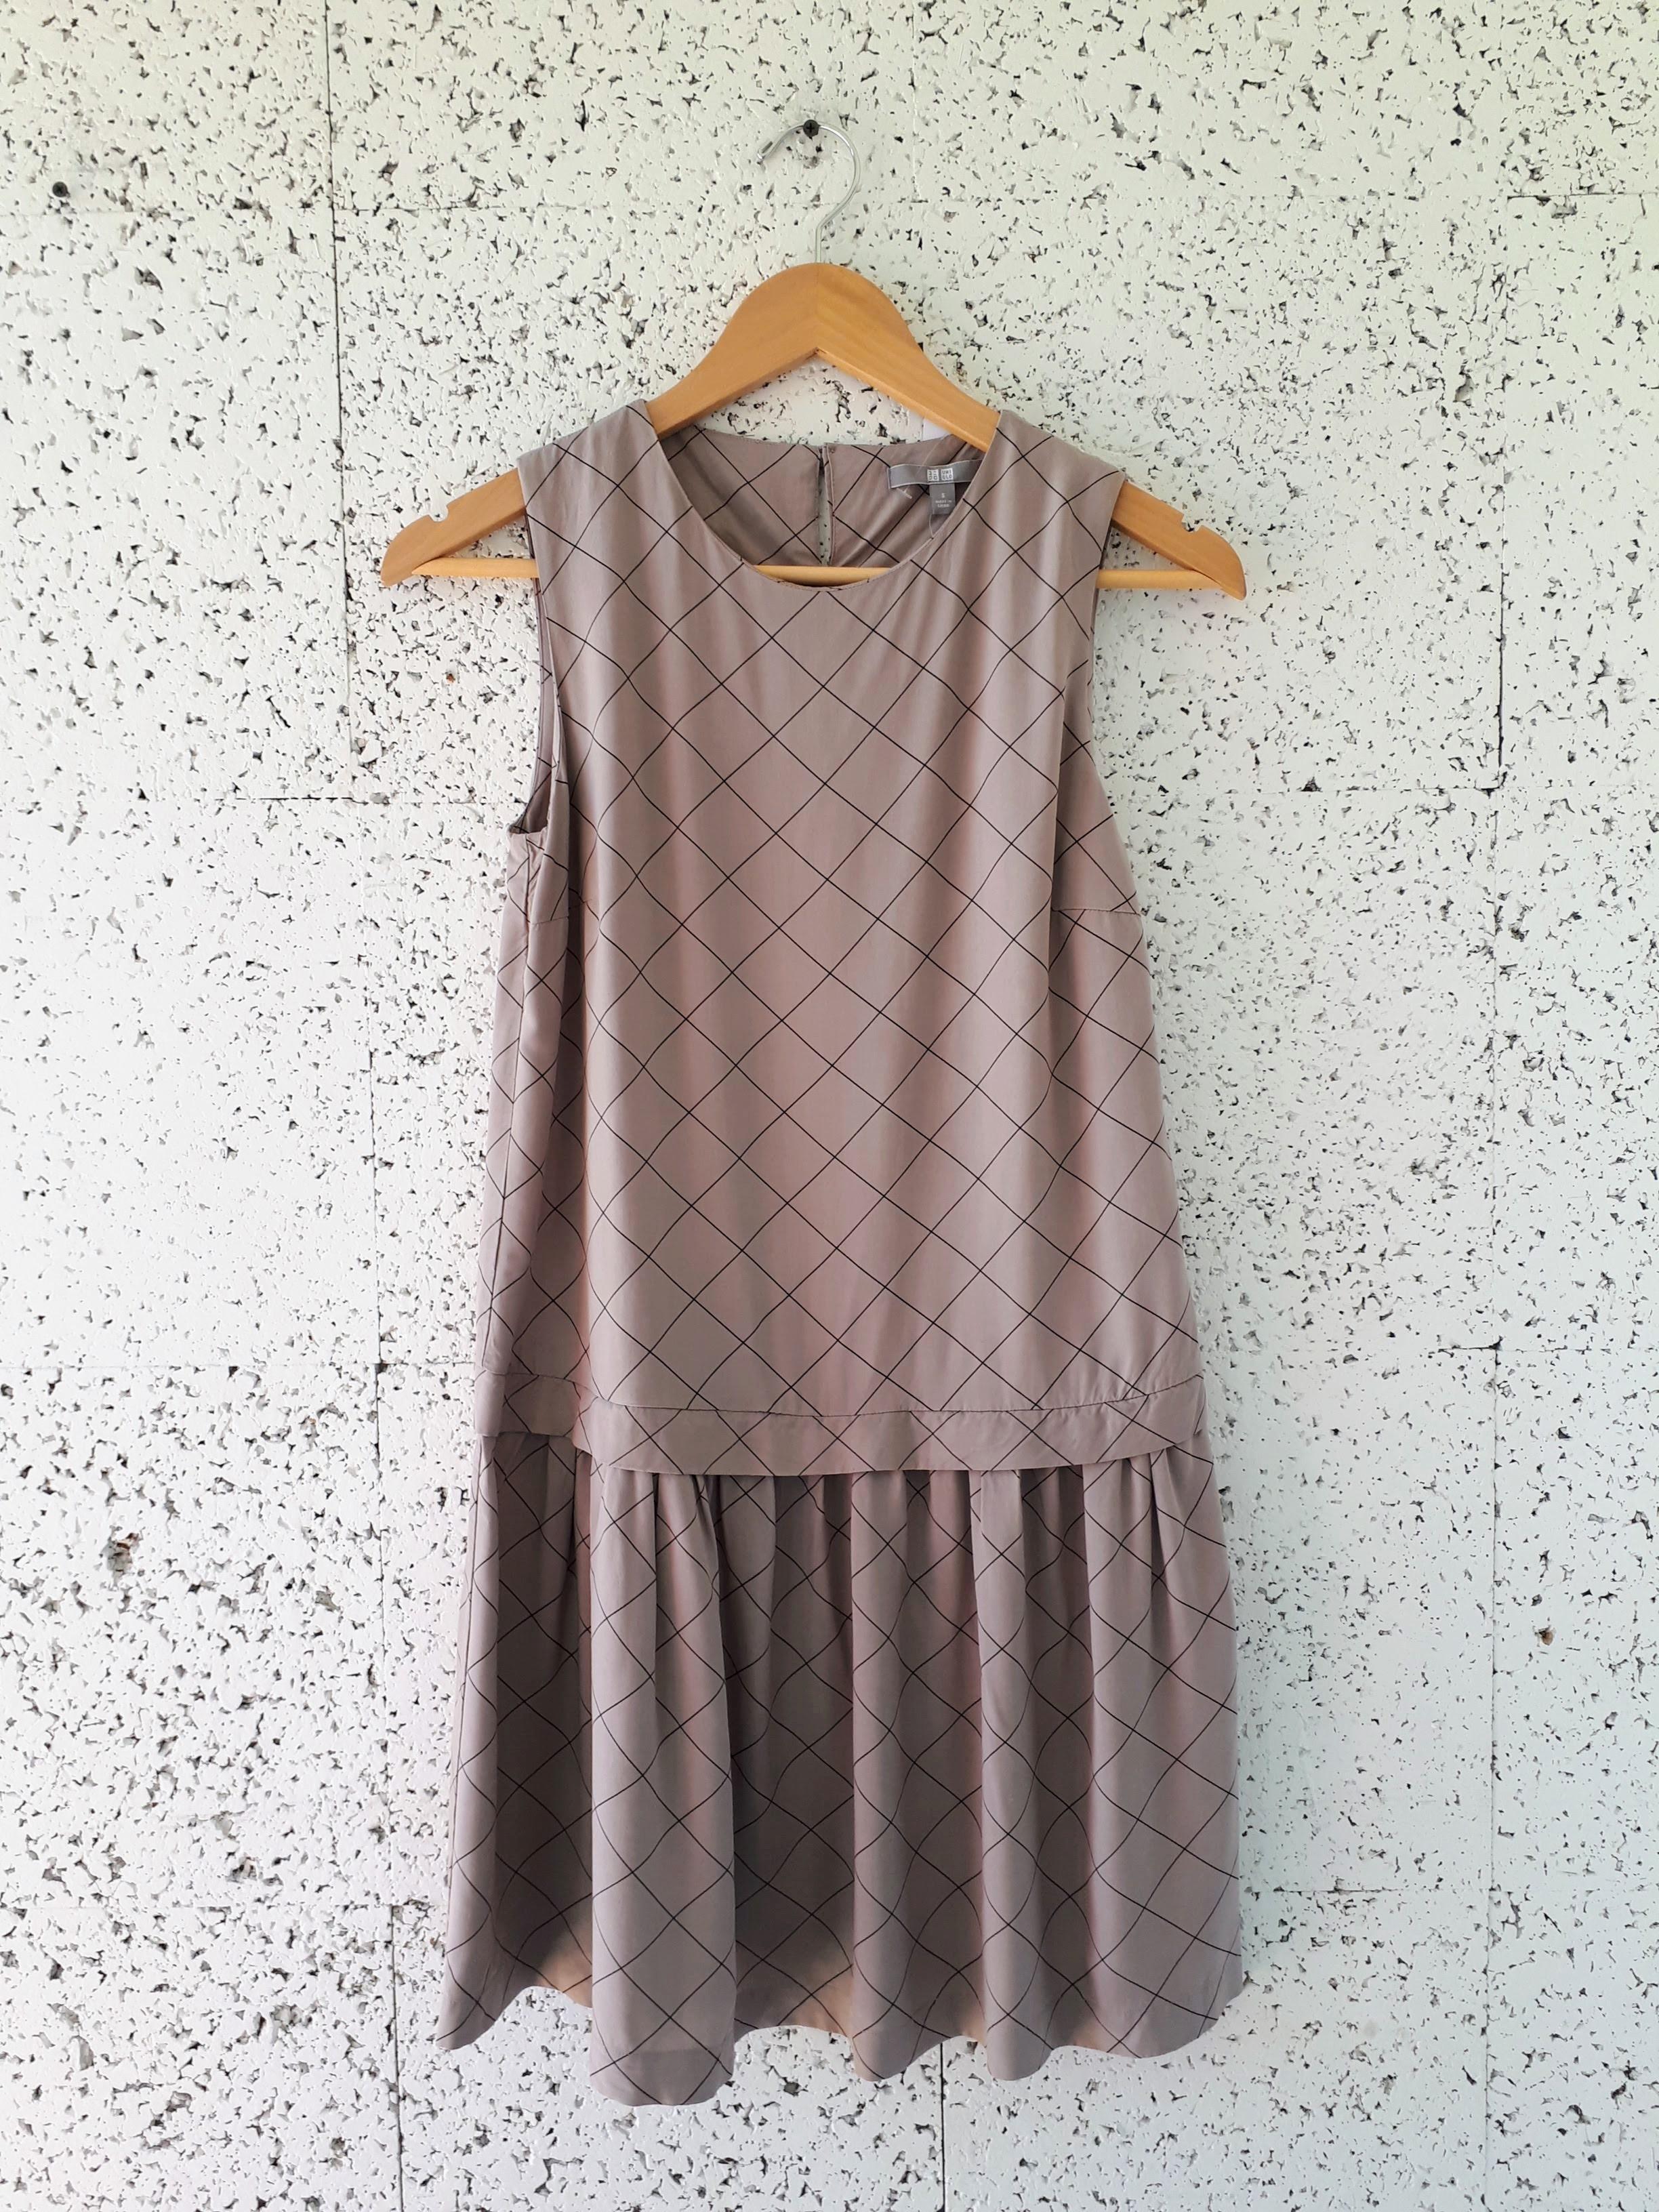 Uniqlo dress (NWT); Size S, $36